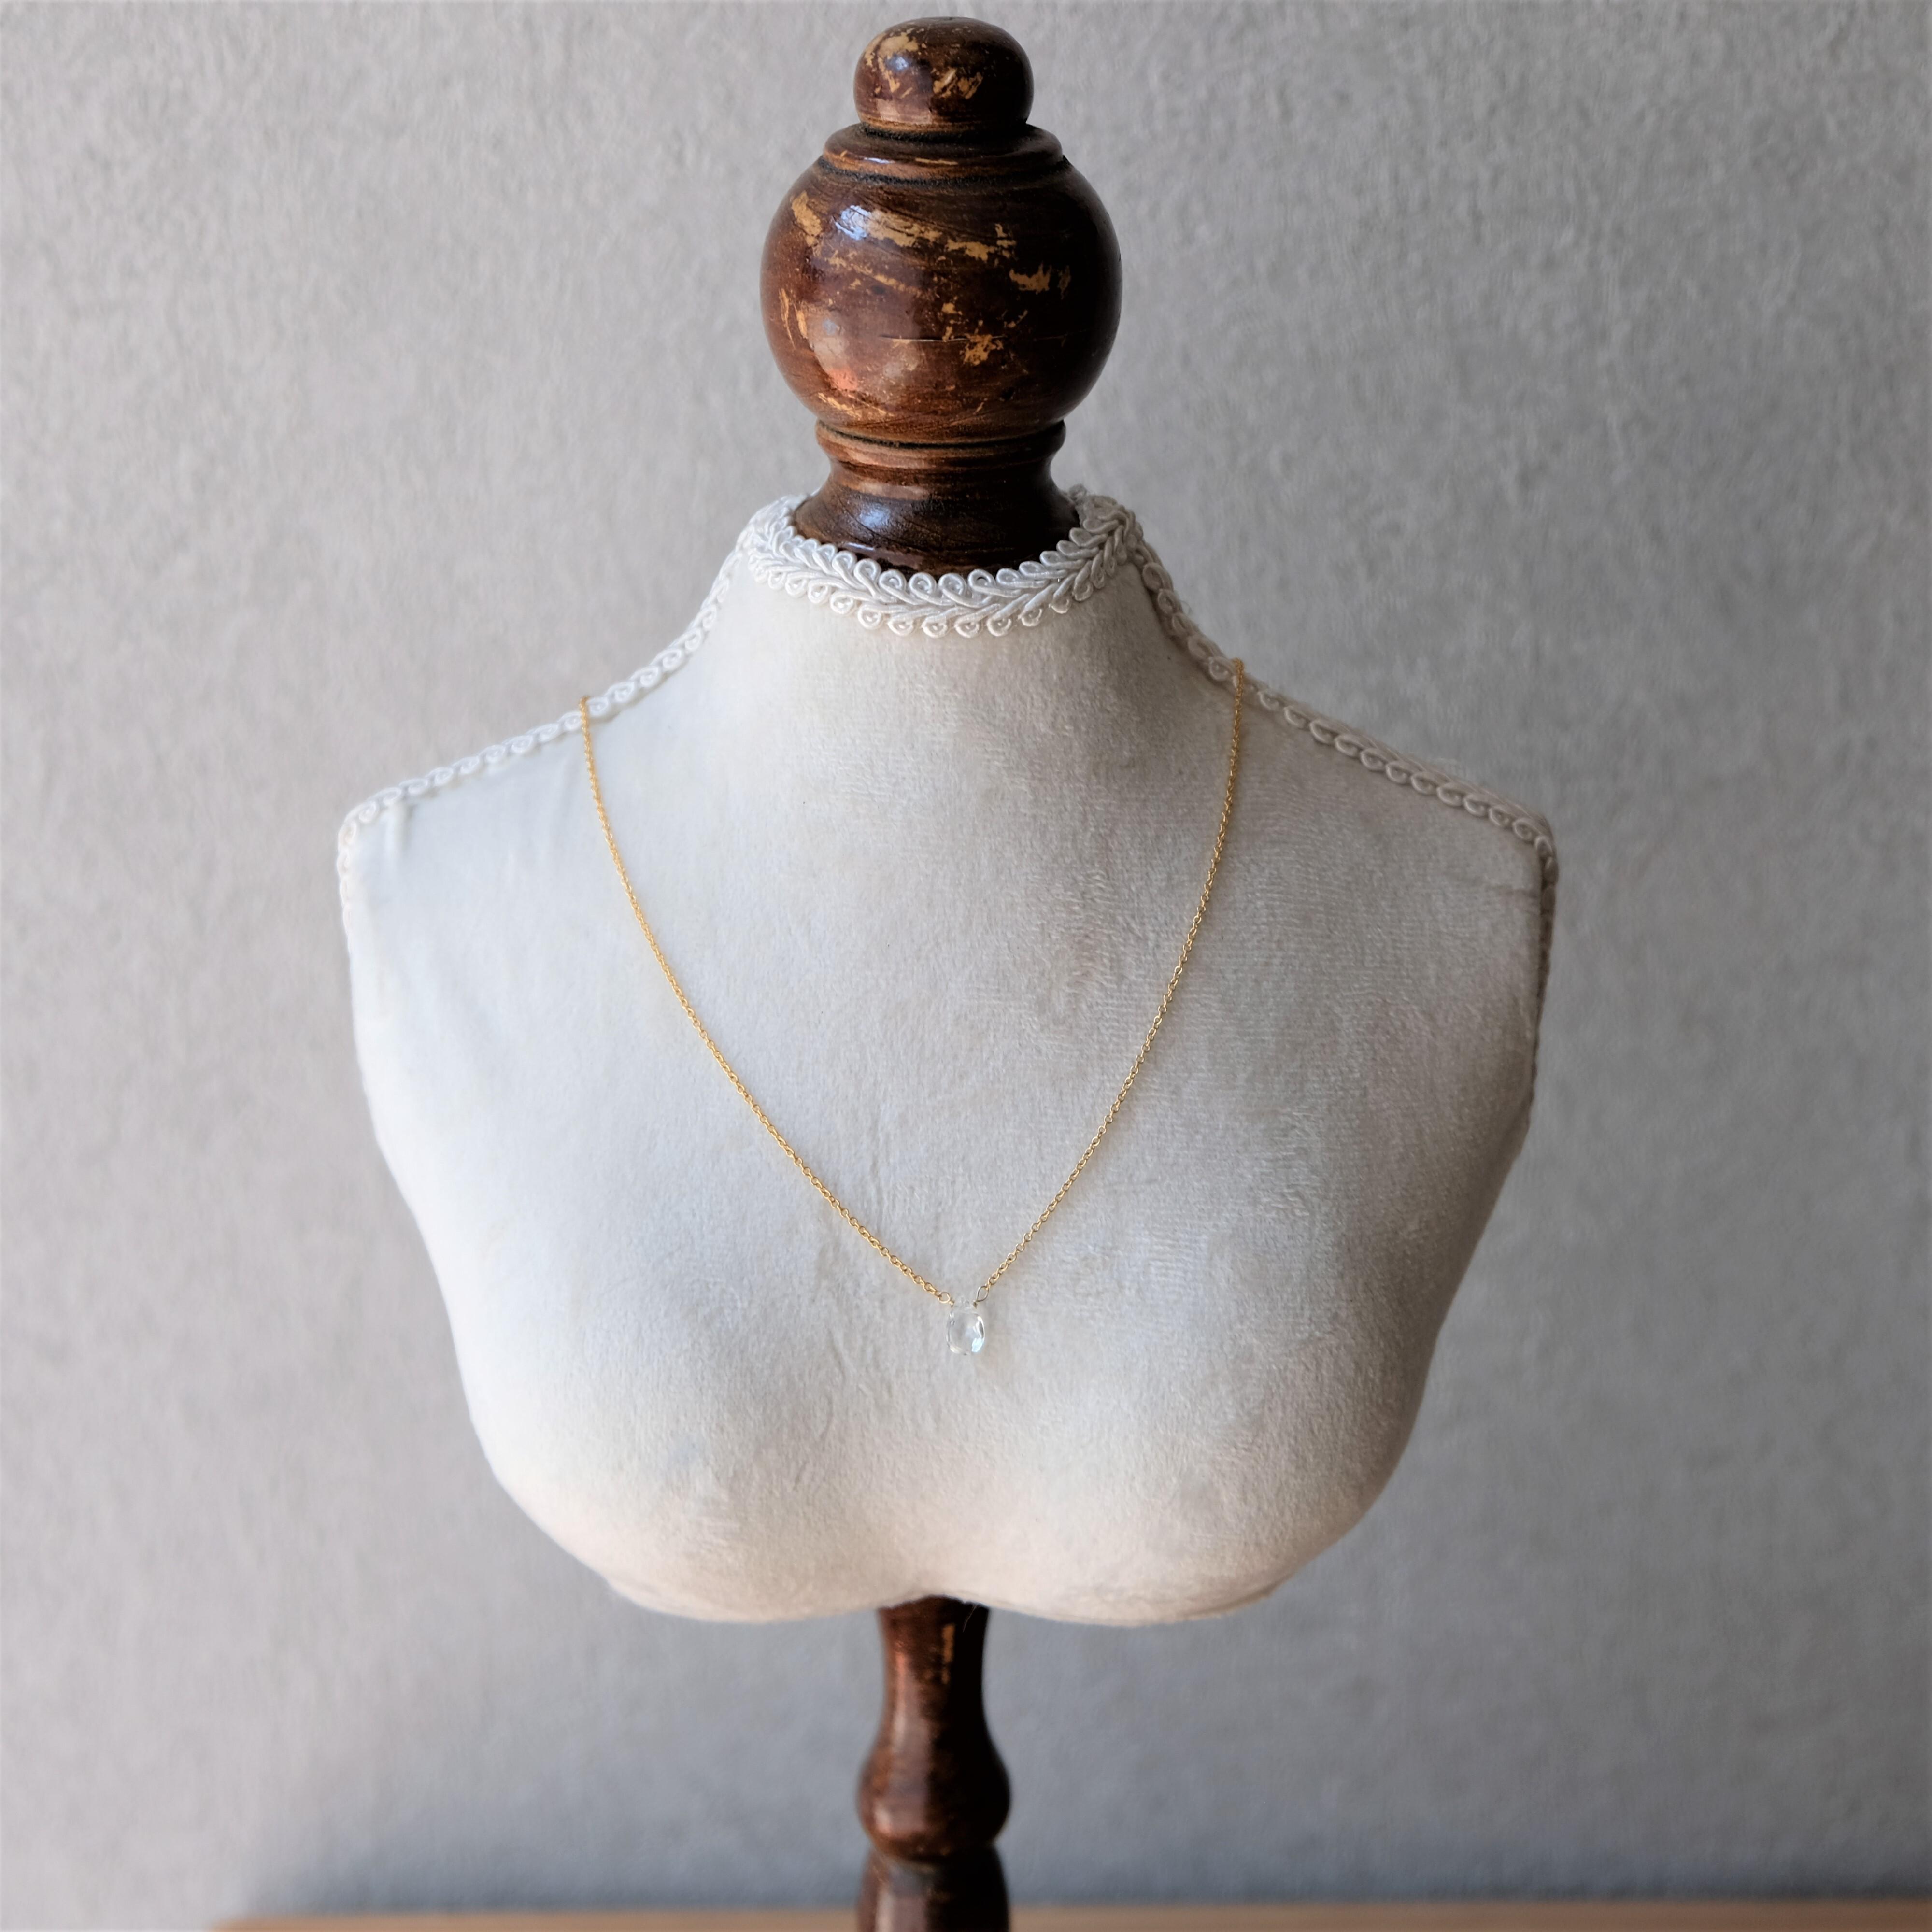 【14kgfネックレス】天然石のネックレス(ホワイトトパーズ)